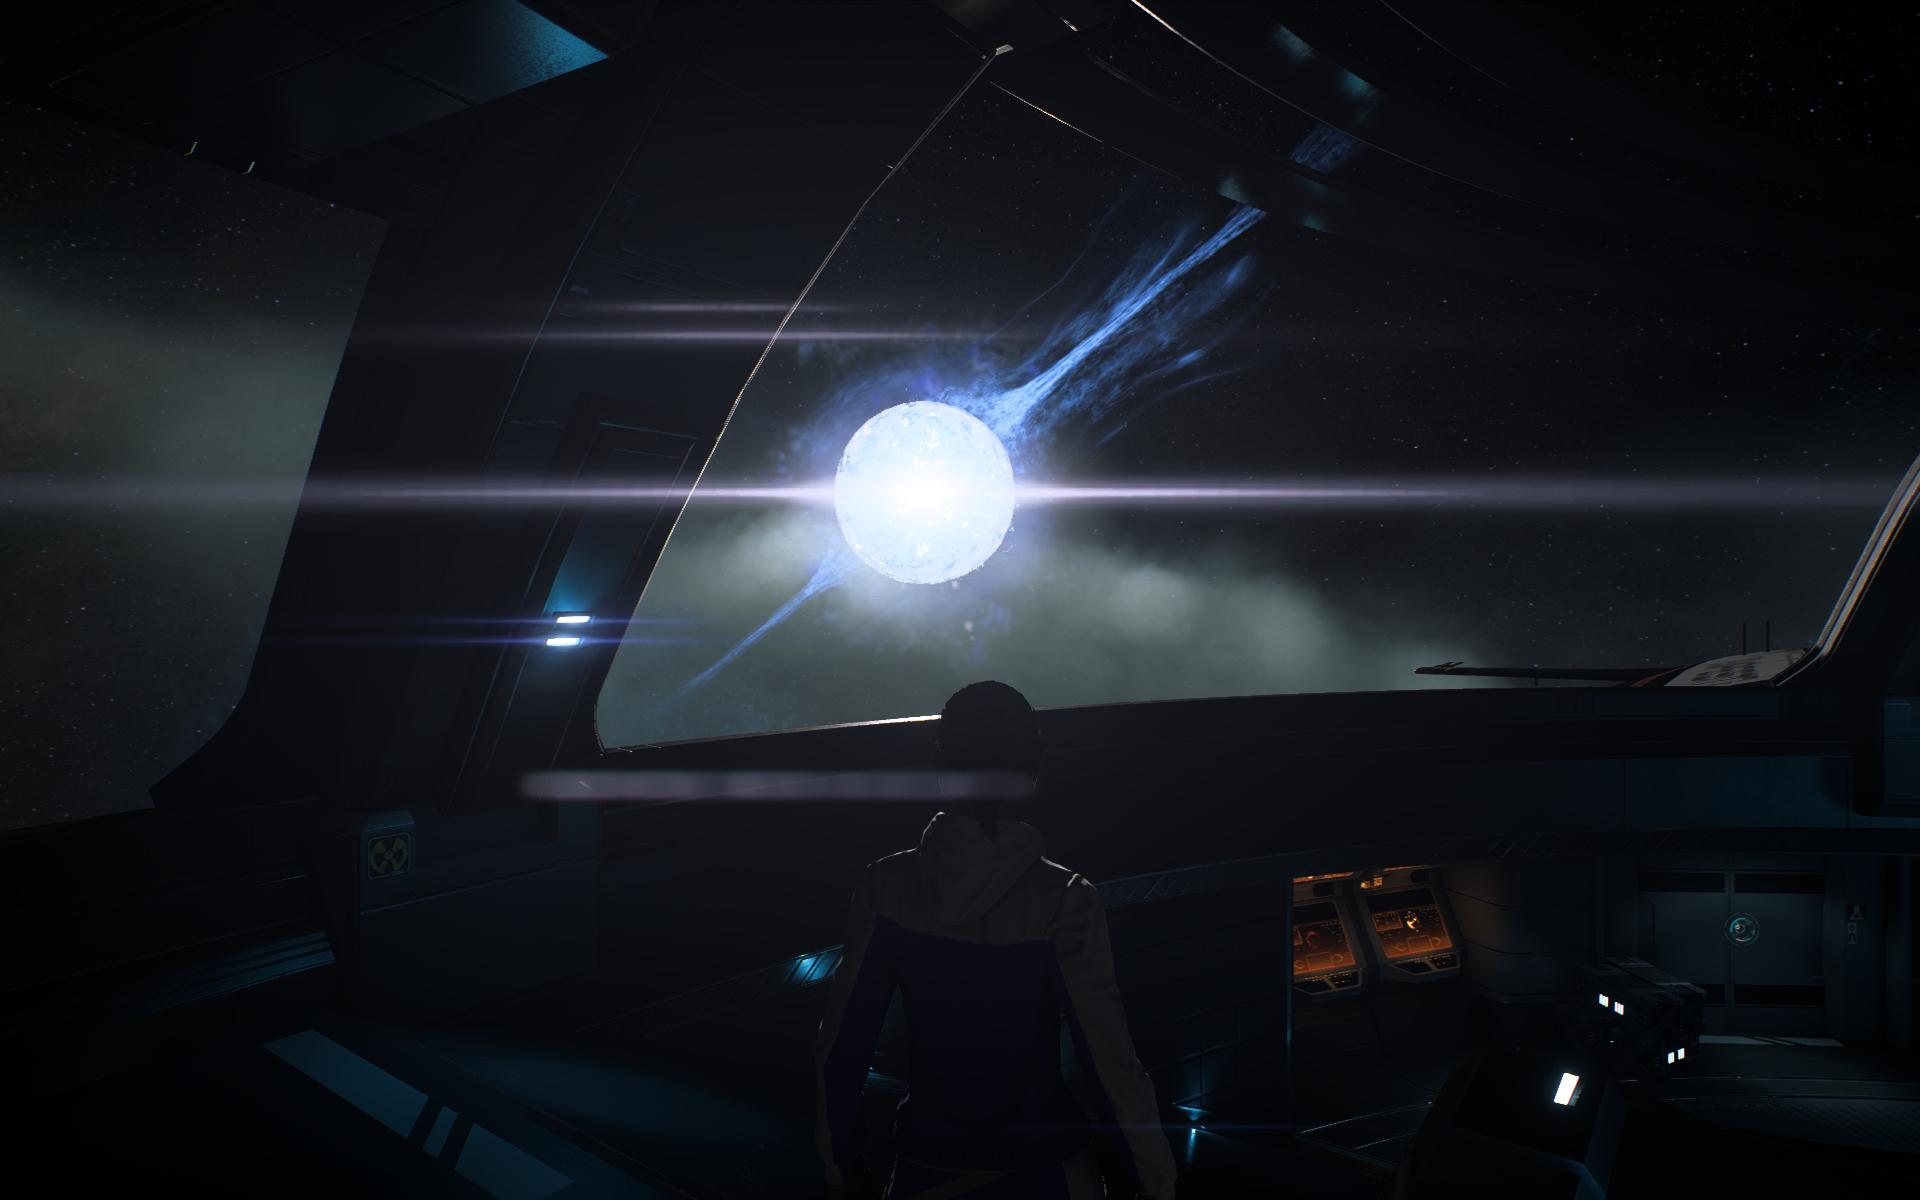 Mass Effect Andromeda Screenshot  - 13.07.49.39.png - Mass Effect: Andromeda